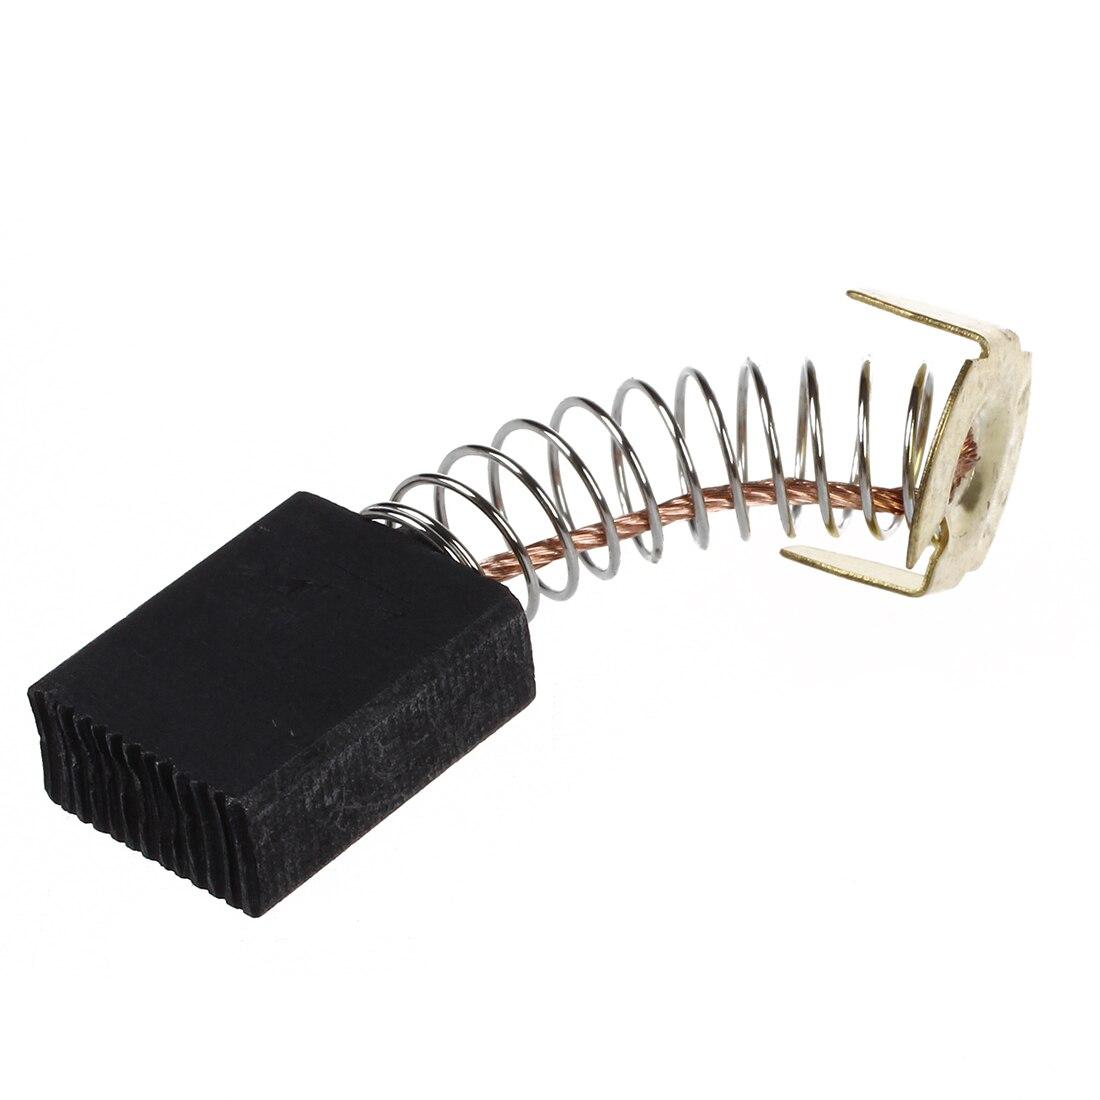 2 Pcs Electric Motor Power Tool Part Carbon Brush 6.5mm X 13.5mm X 18 Mm